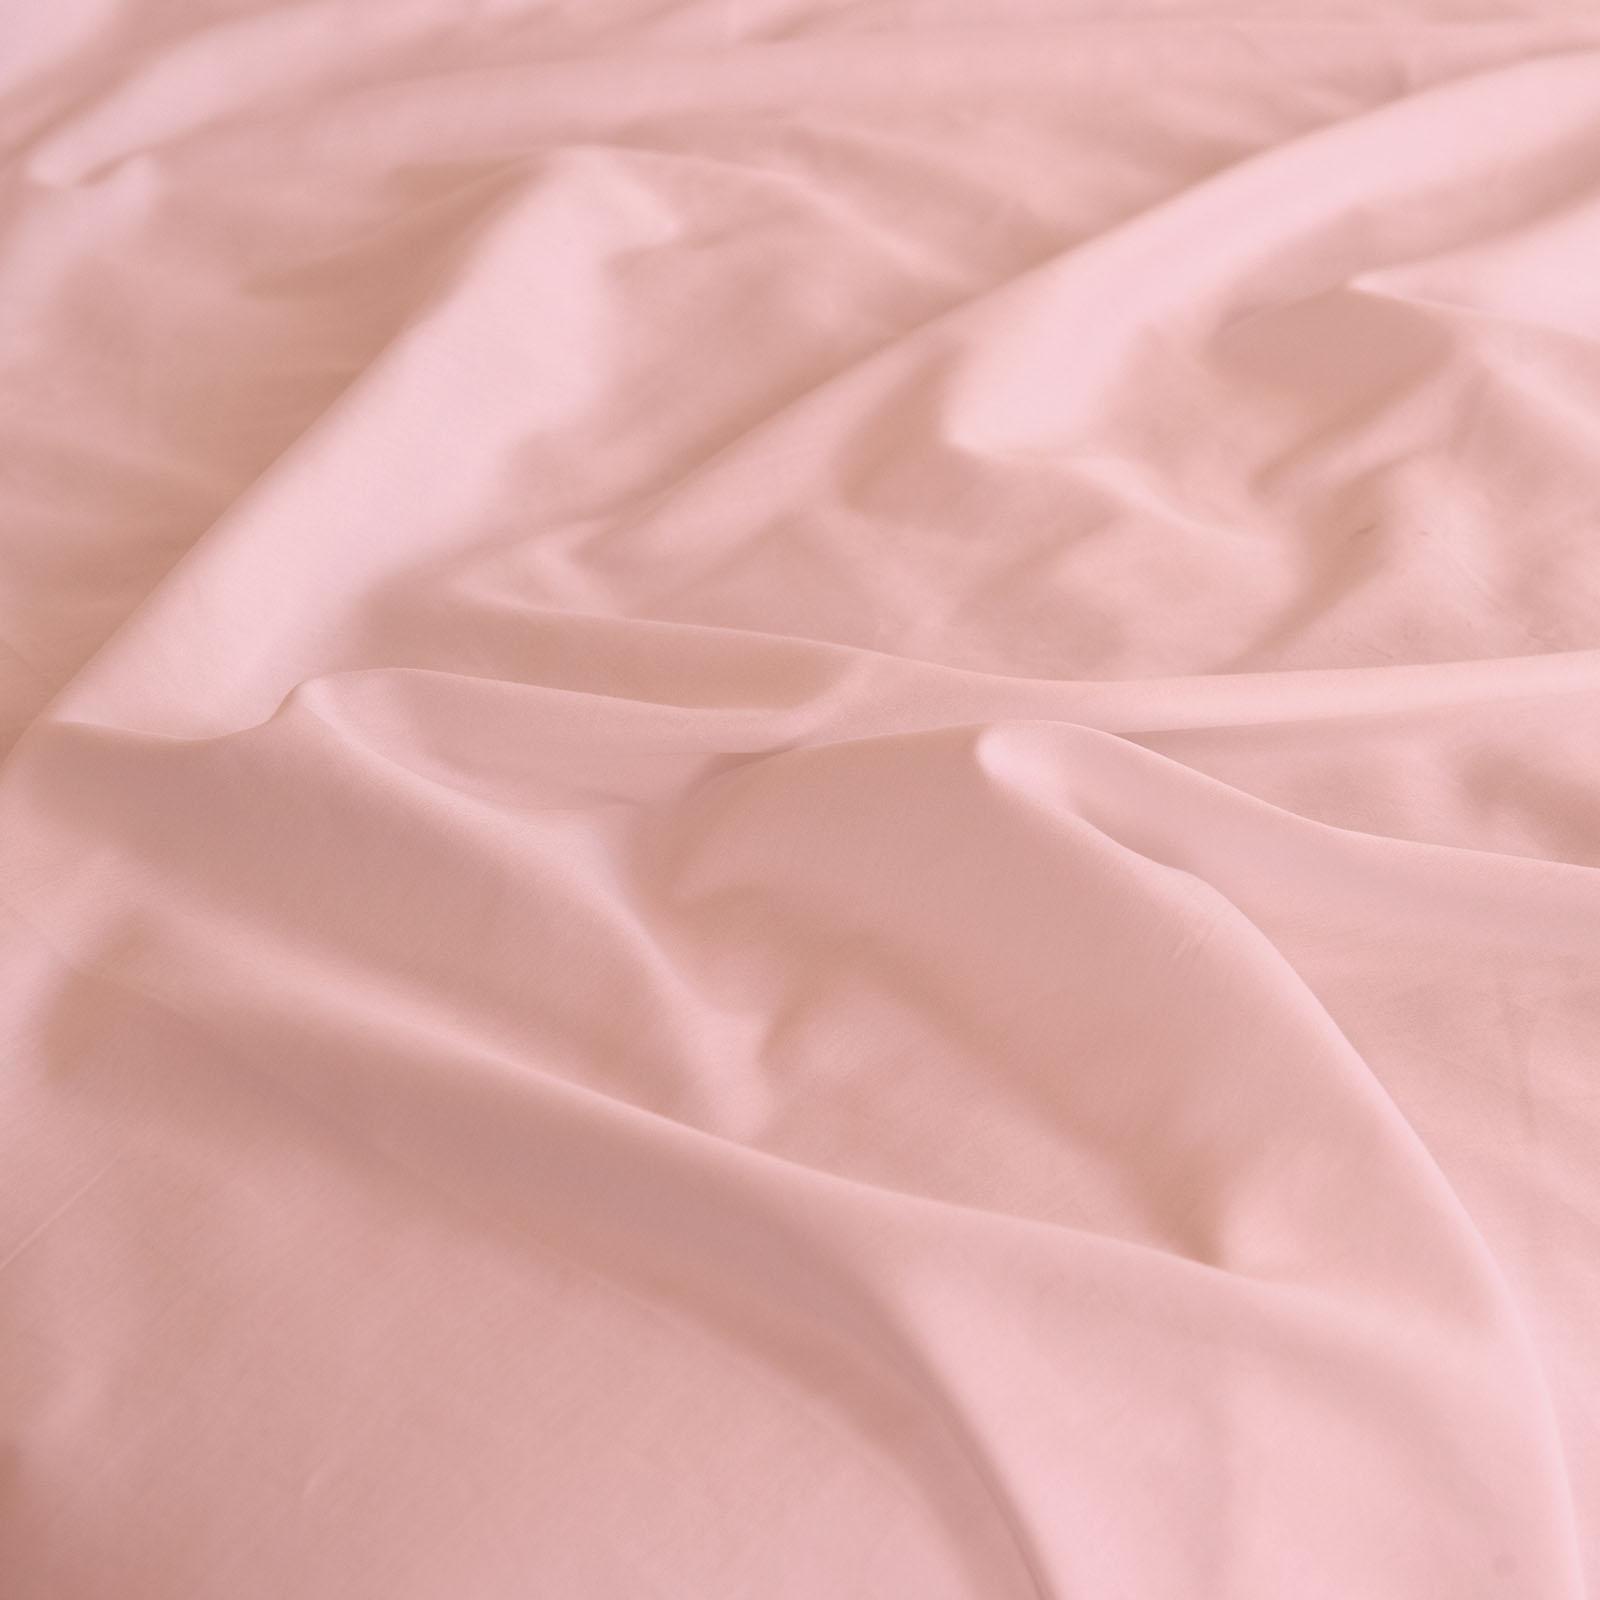 thumbnail 21 - Royal Comfort 1000TC Hotel Grade Bamboo Cotton Sheets Pillowcases Set Ultrasoft